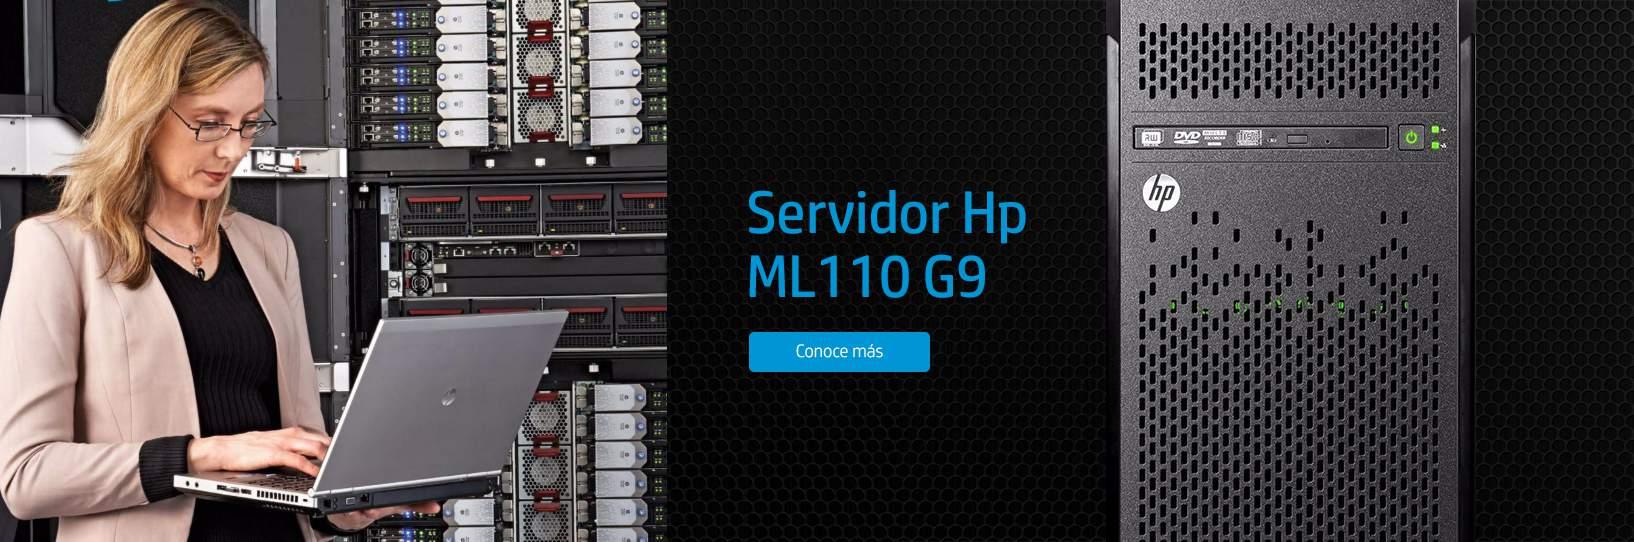 servidor-hp-ml110-g9.jpg